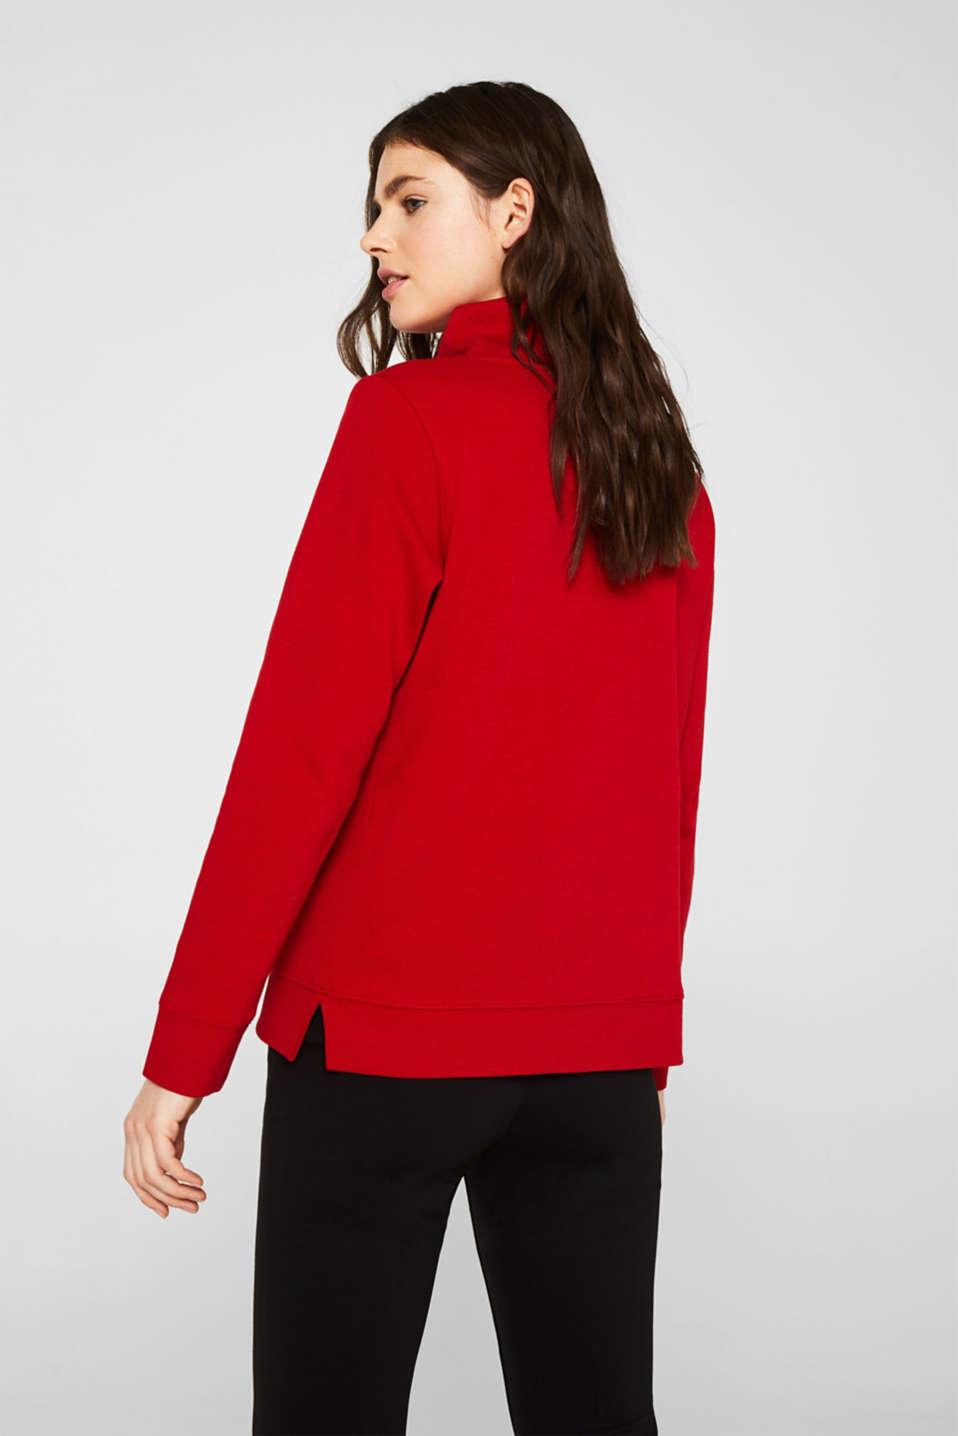 Piqué texture sweatshirt, DARK RED, detail image number 3